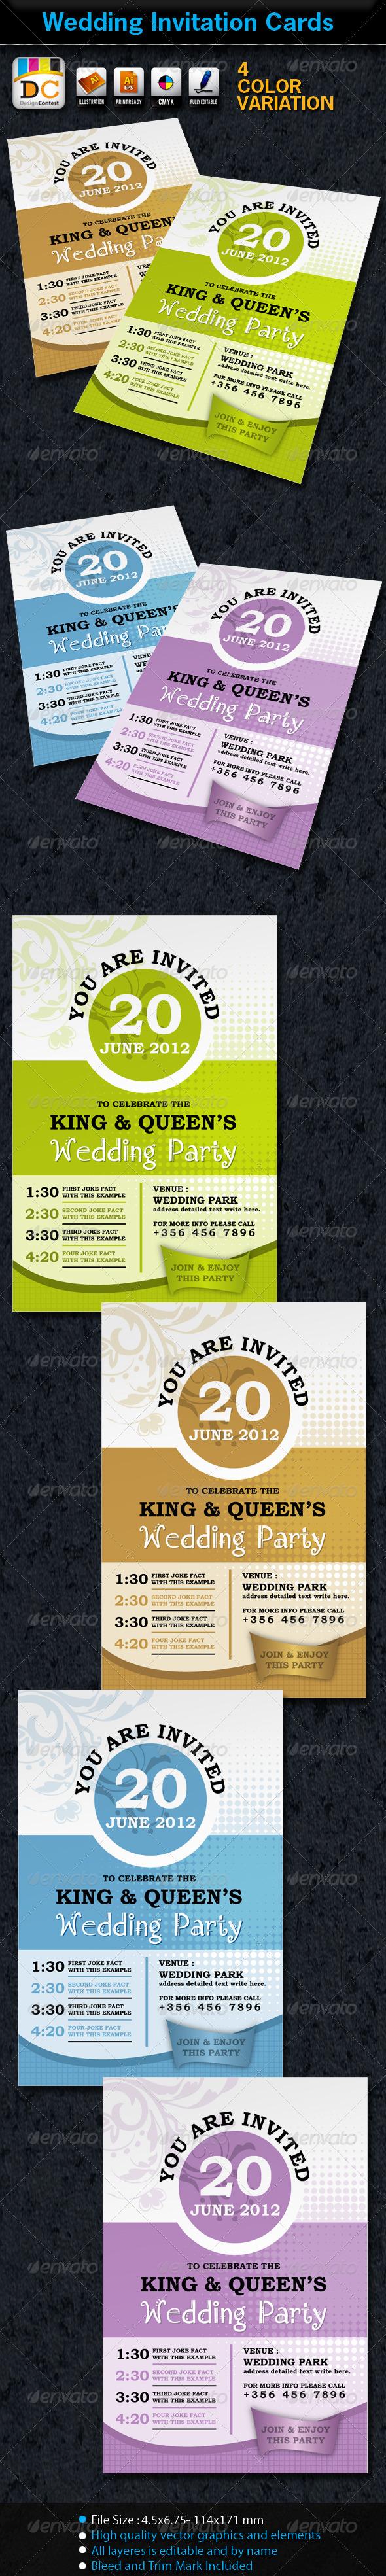 Wedding Marriage Invitation Card Sets